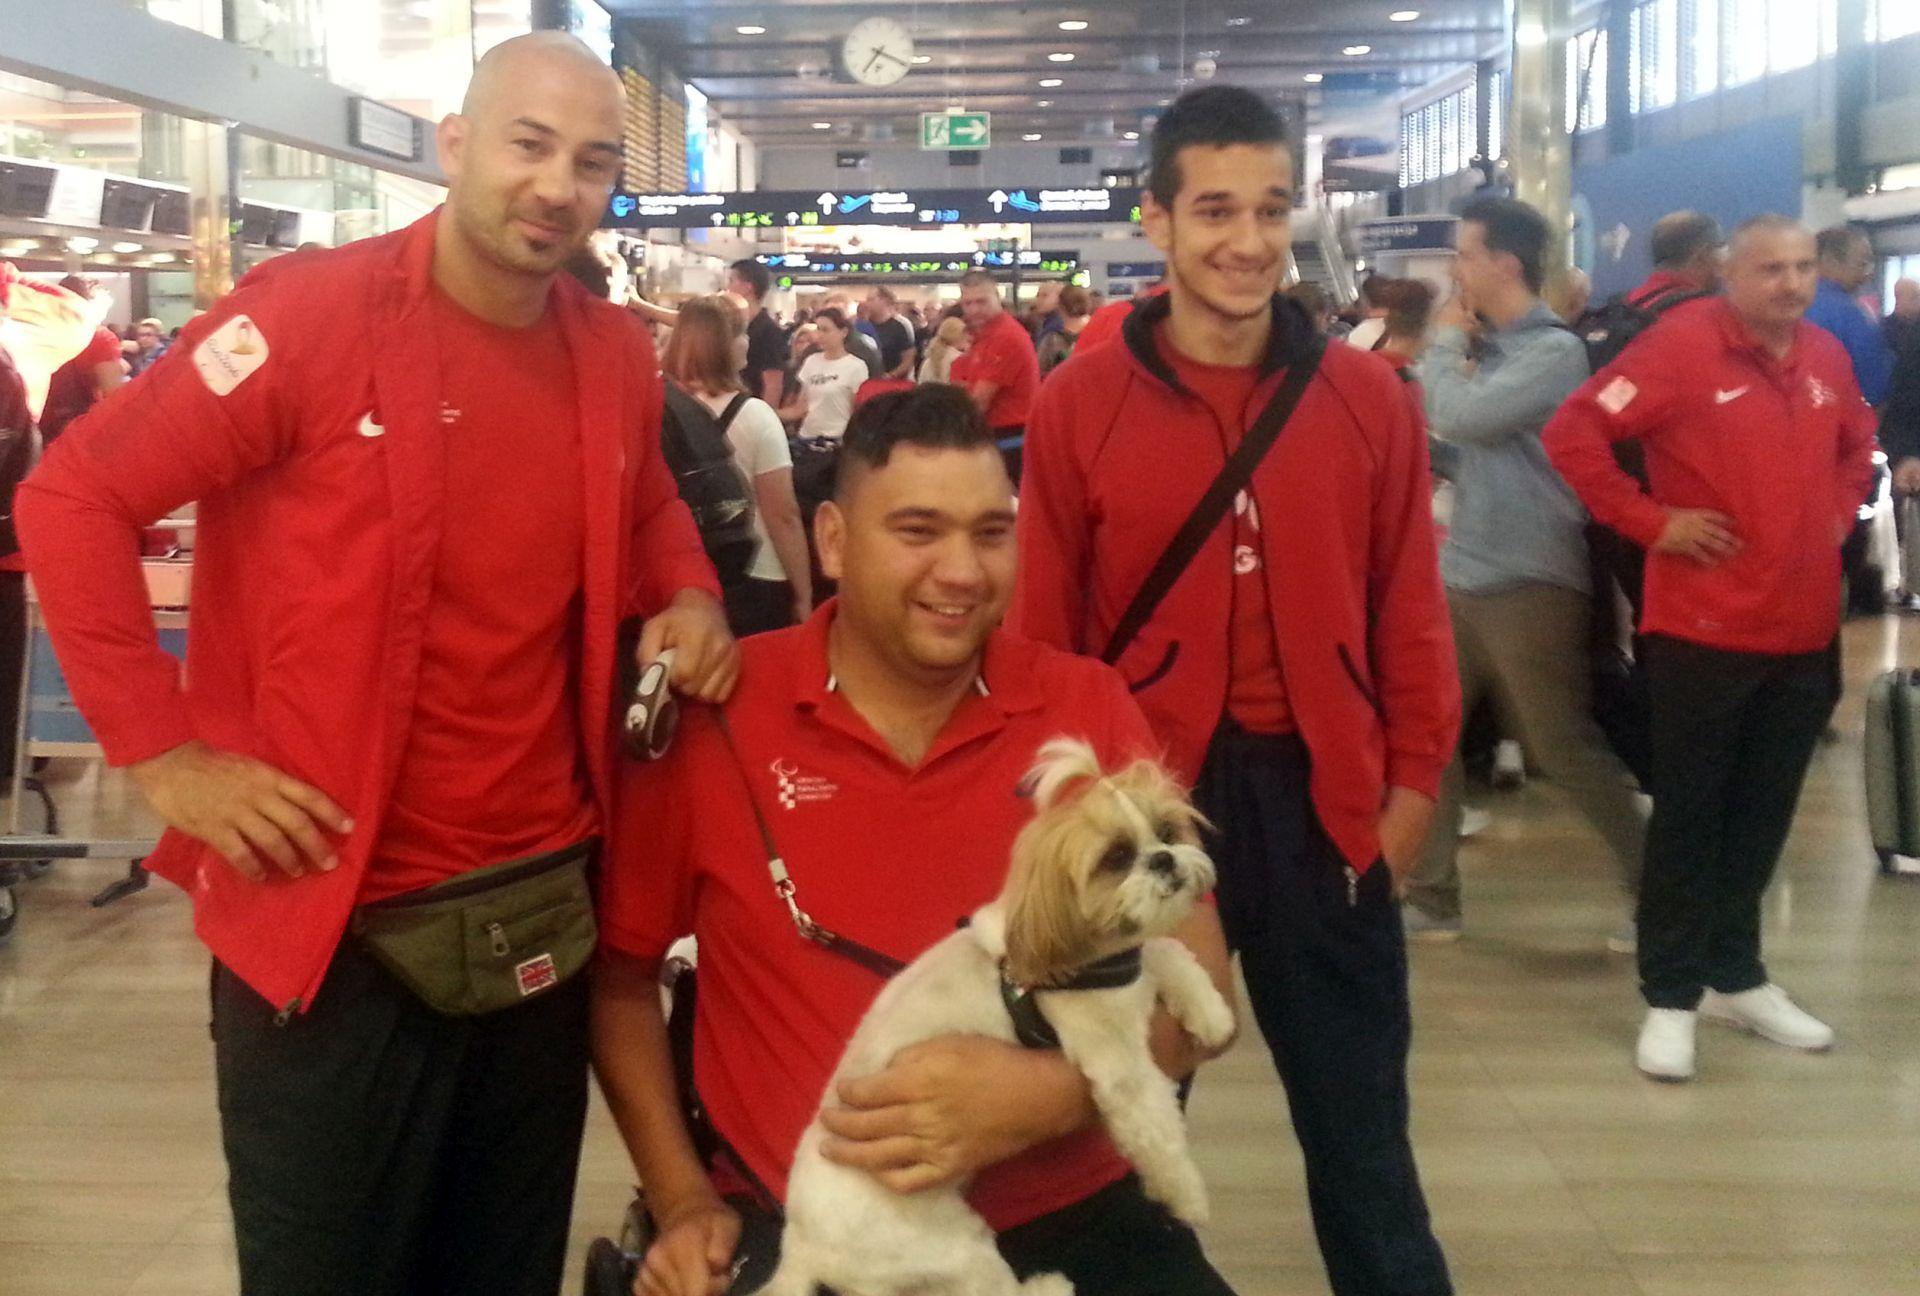 POI RIO: Prvi hrvatski paraolimpijci stigli u Rio de Janero